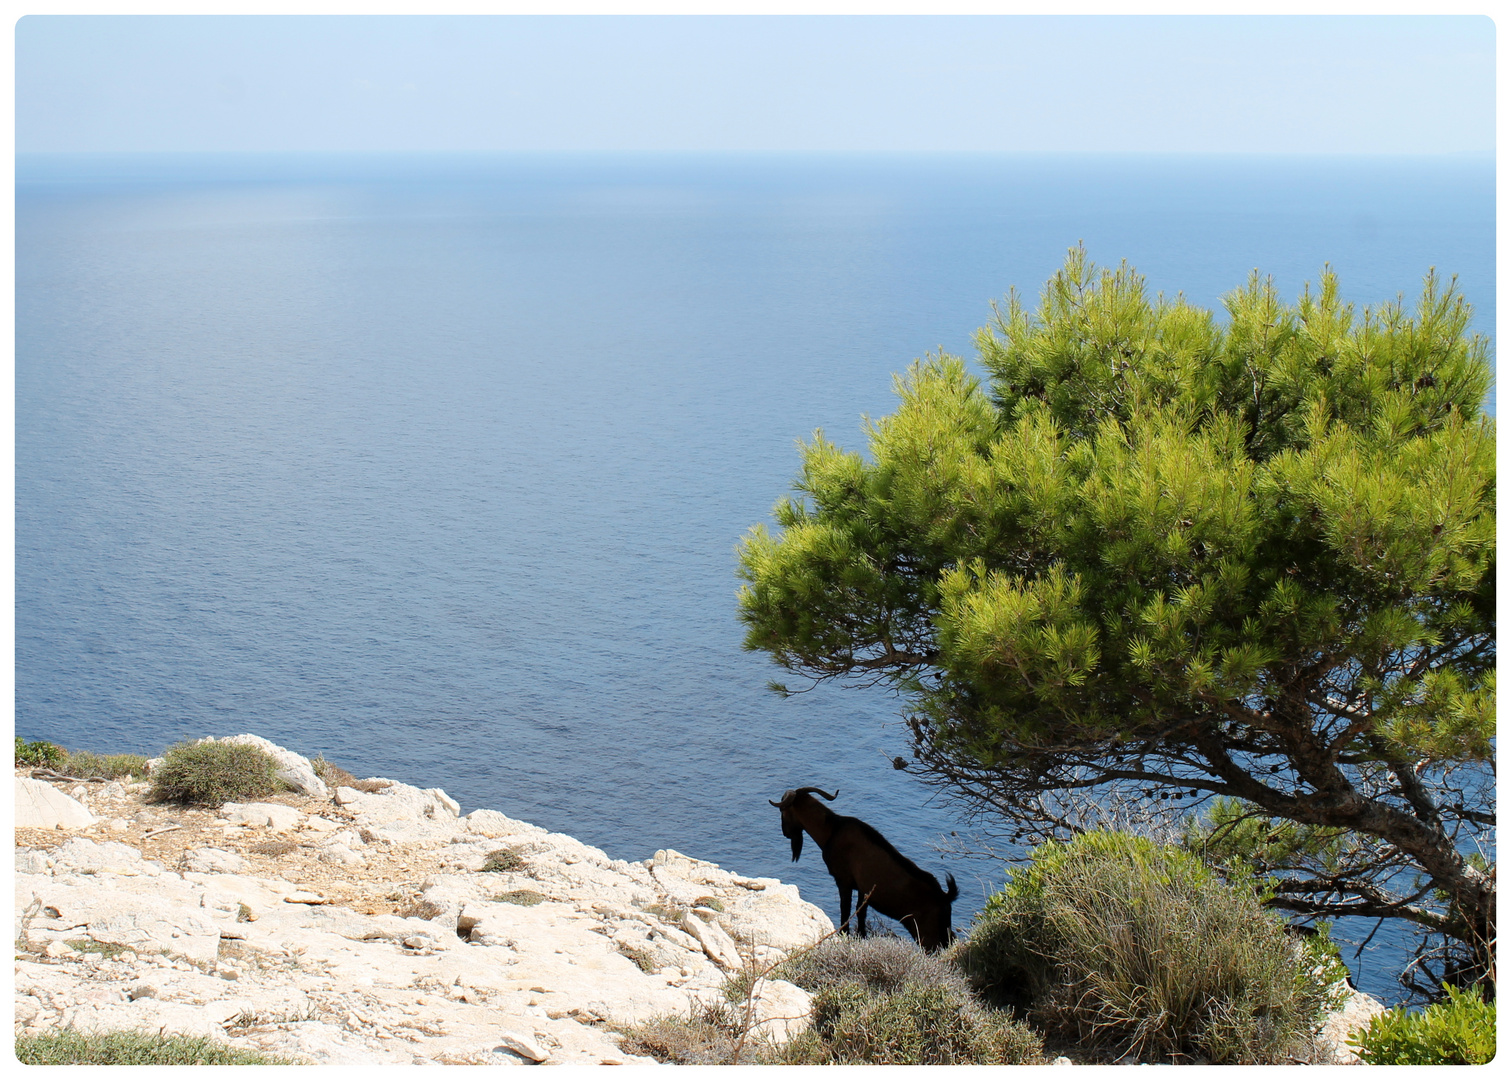 Ziegenbock am Cap de Formentor